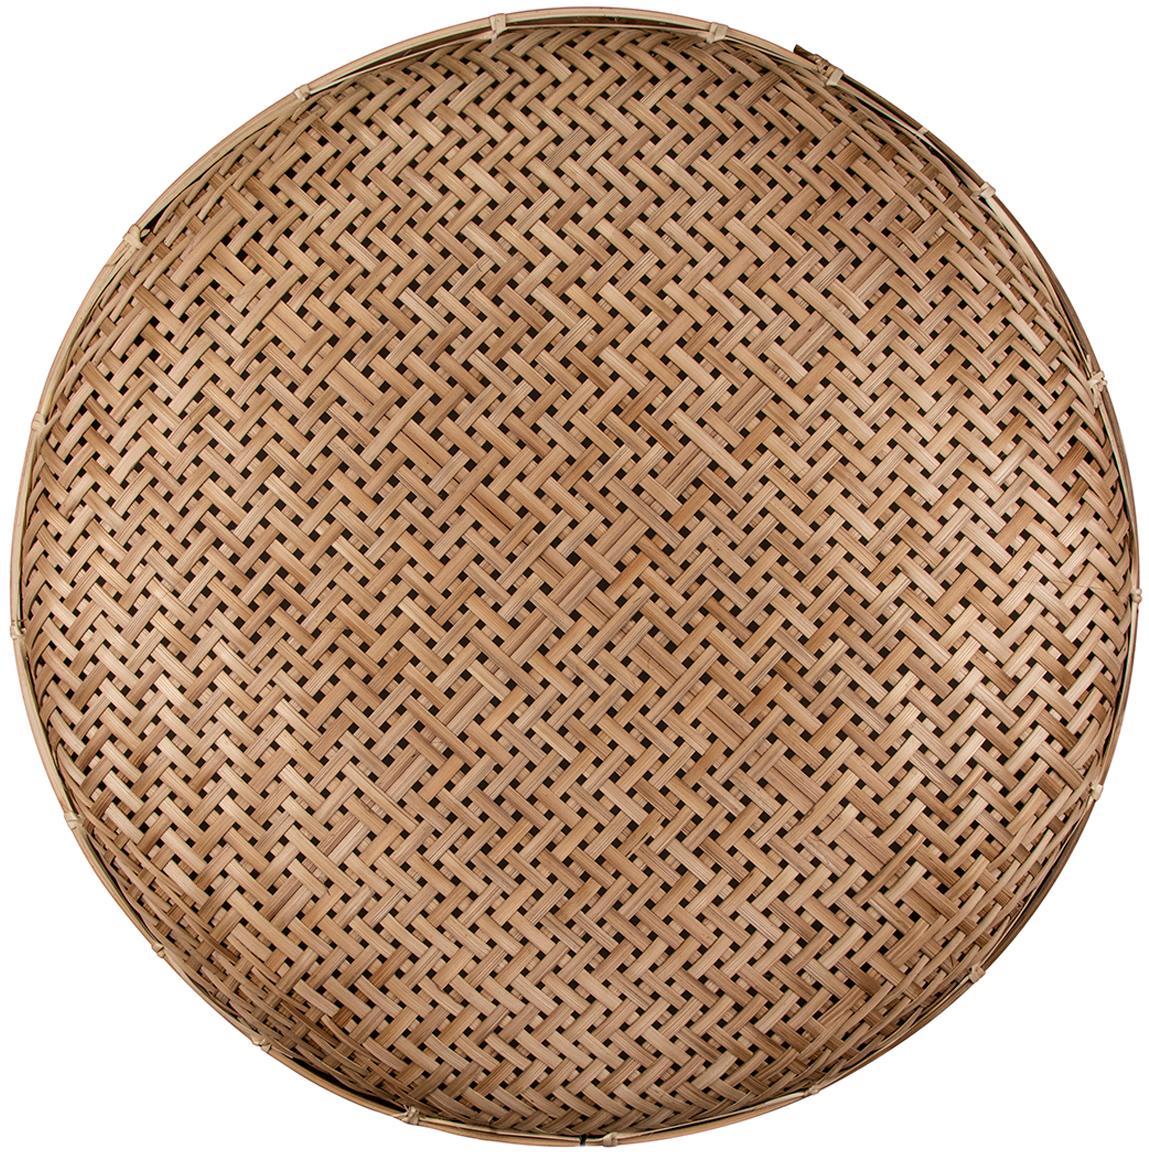 Aplique de ratán Aruba, con enchufe, Pantalla: ratán, Cable: plástico, Ratán, Ø 50 x F 5 cm